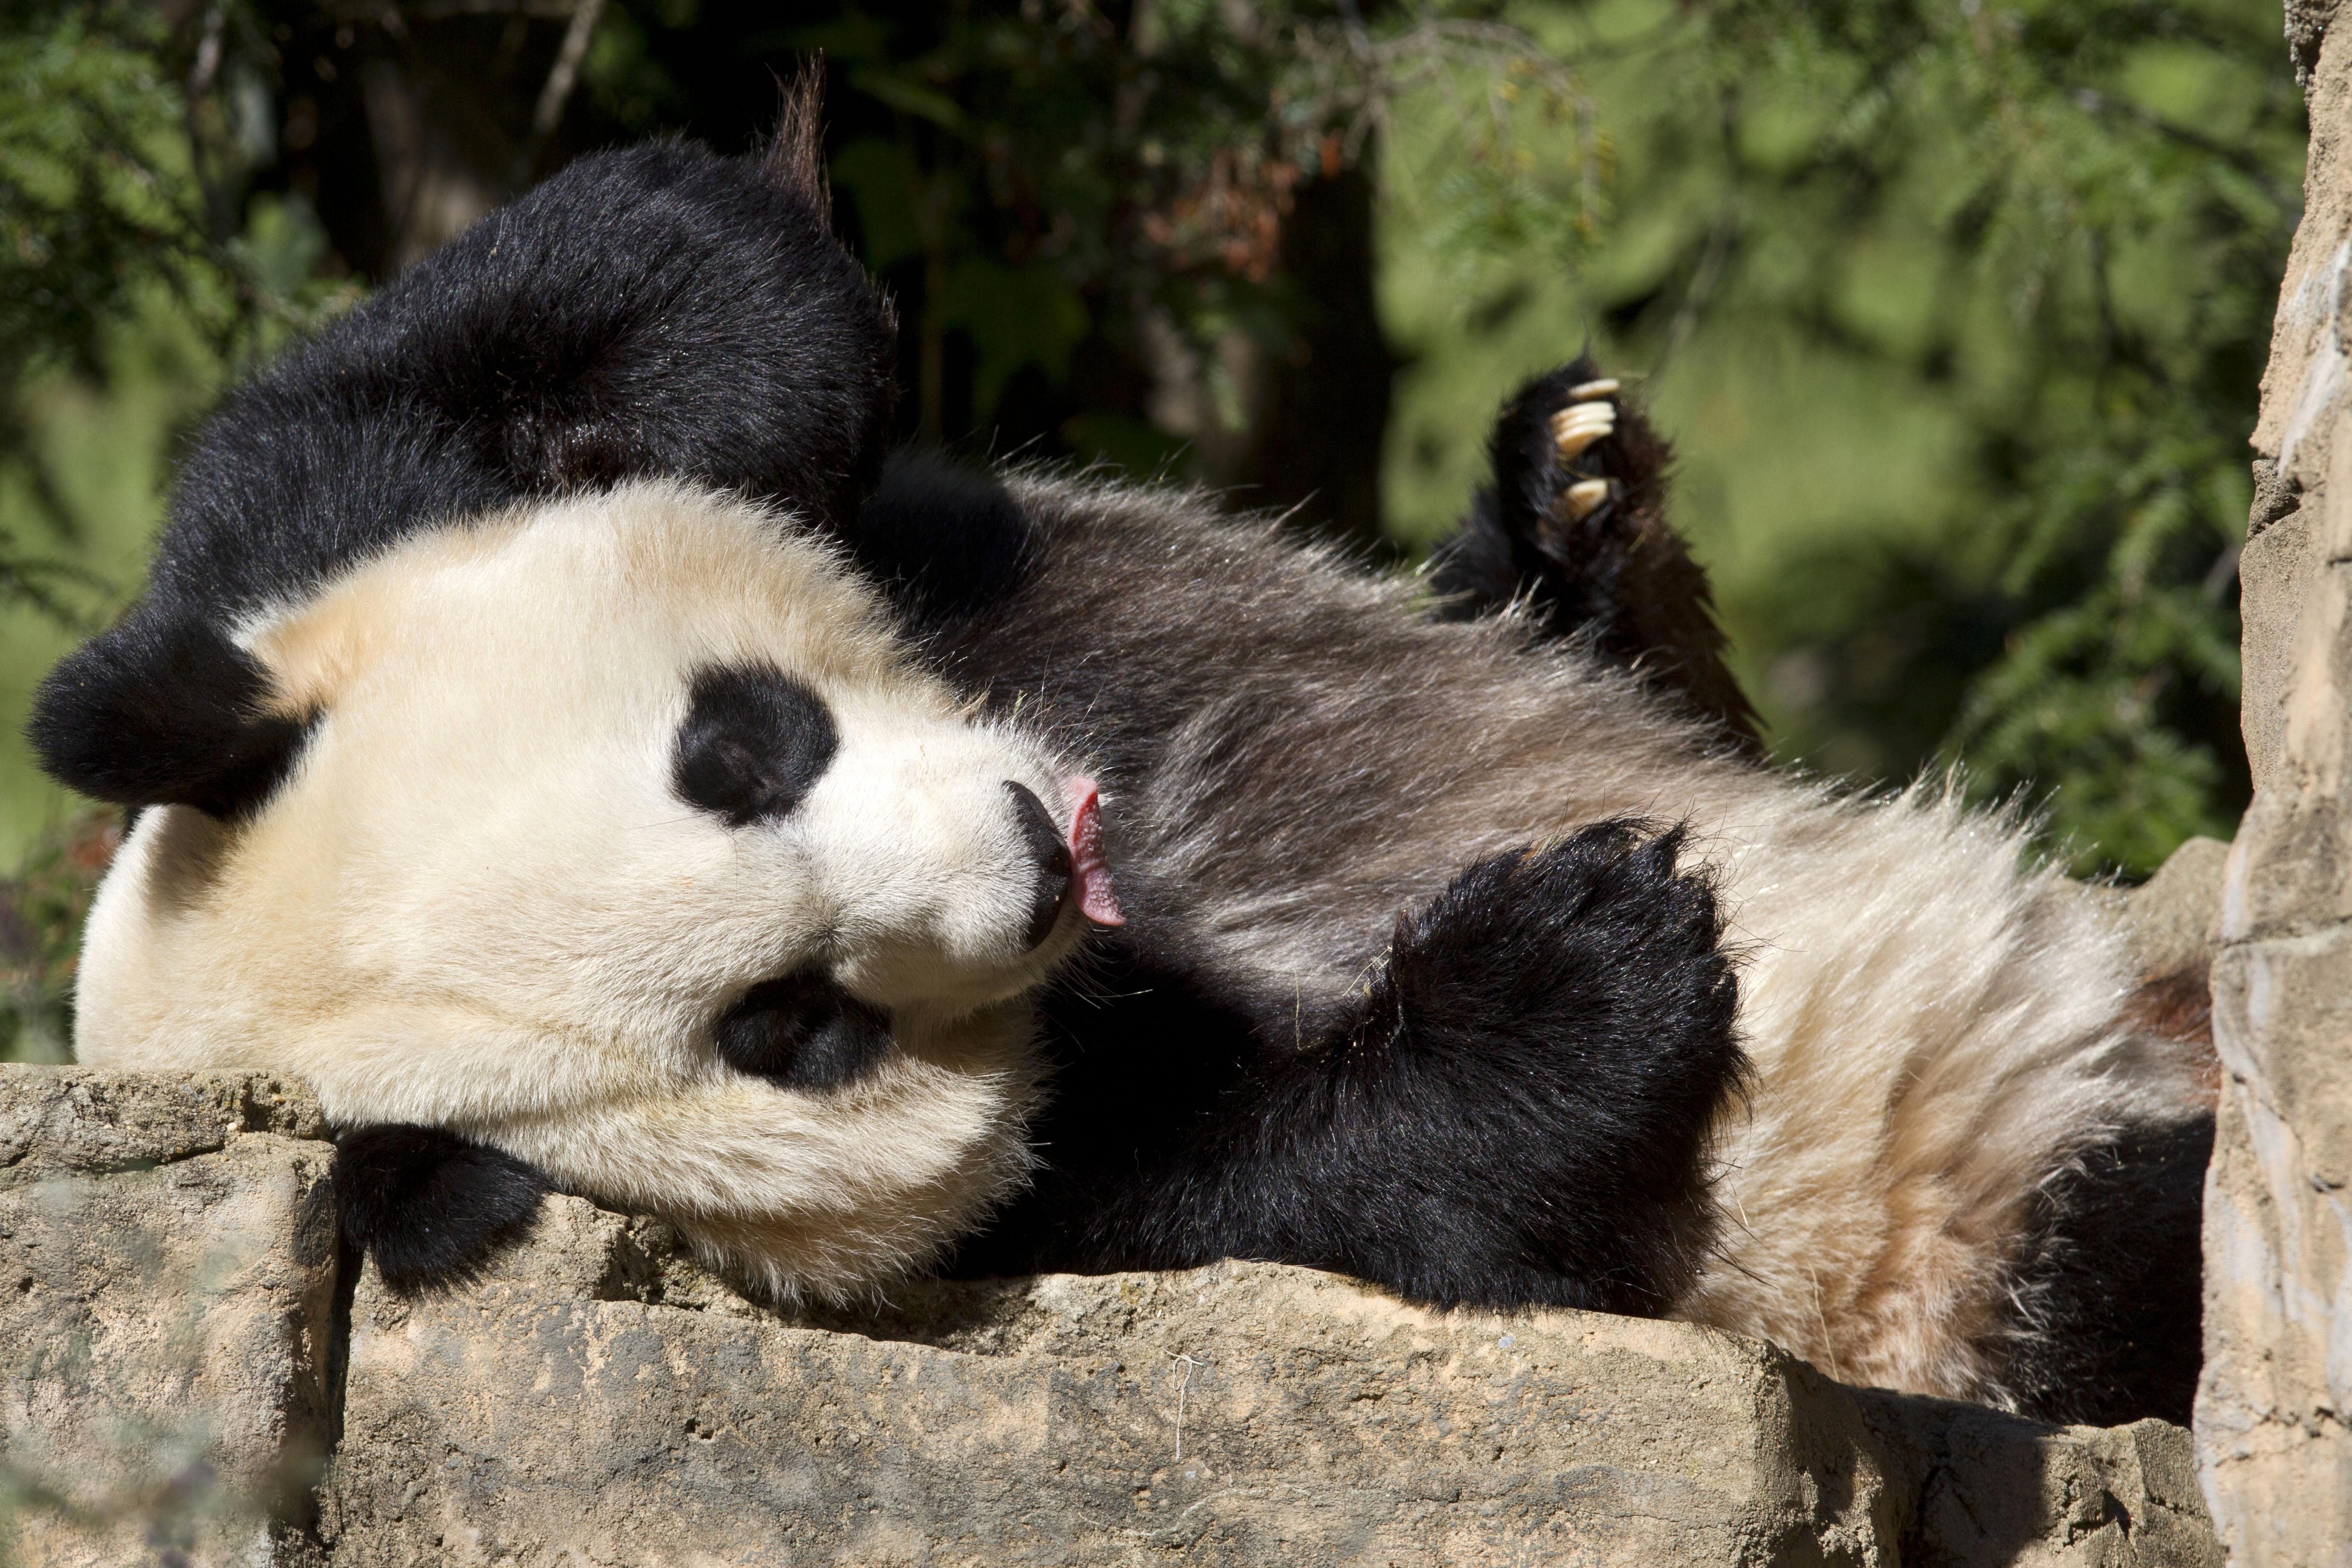 Giant panda Mei Xiang celebrates 17th birthday at National Zoo